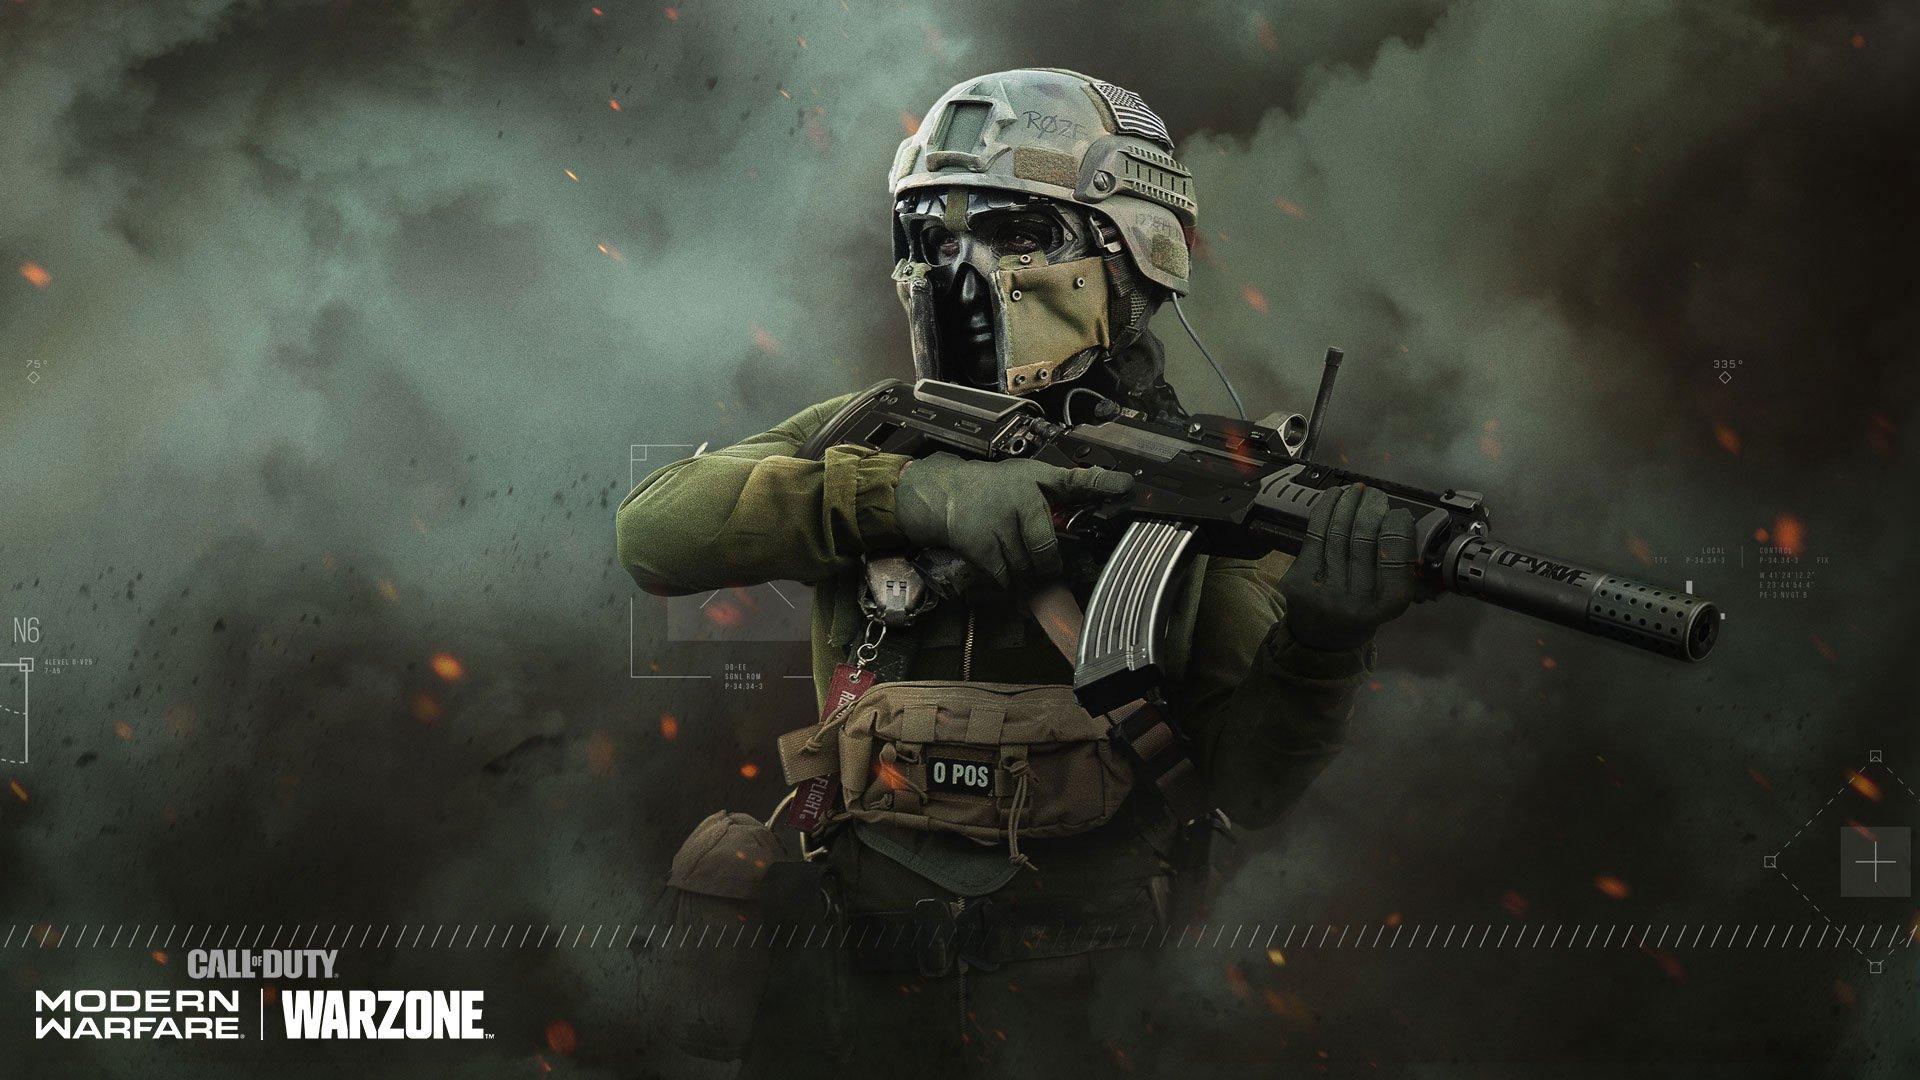 Warzone Roze Skin